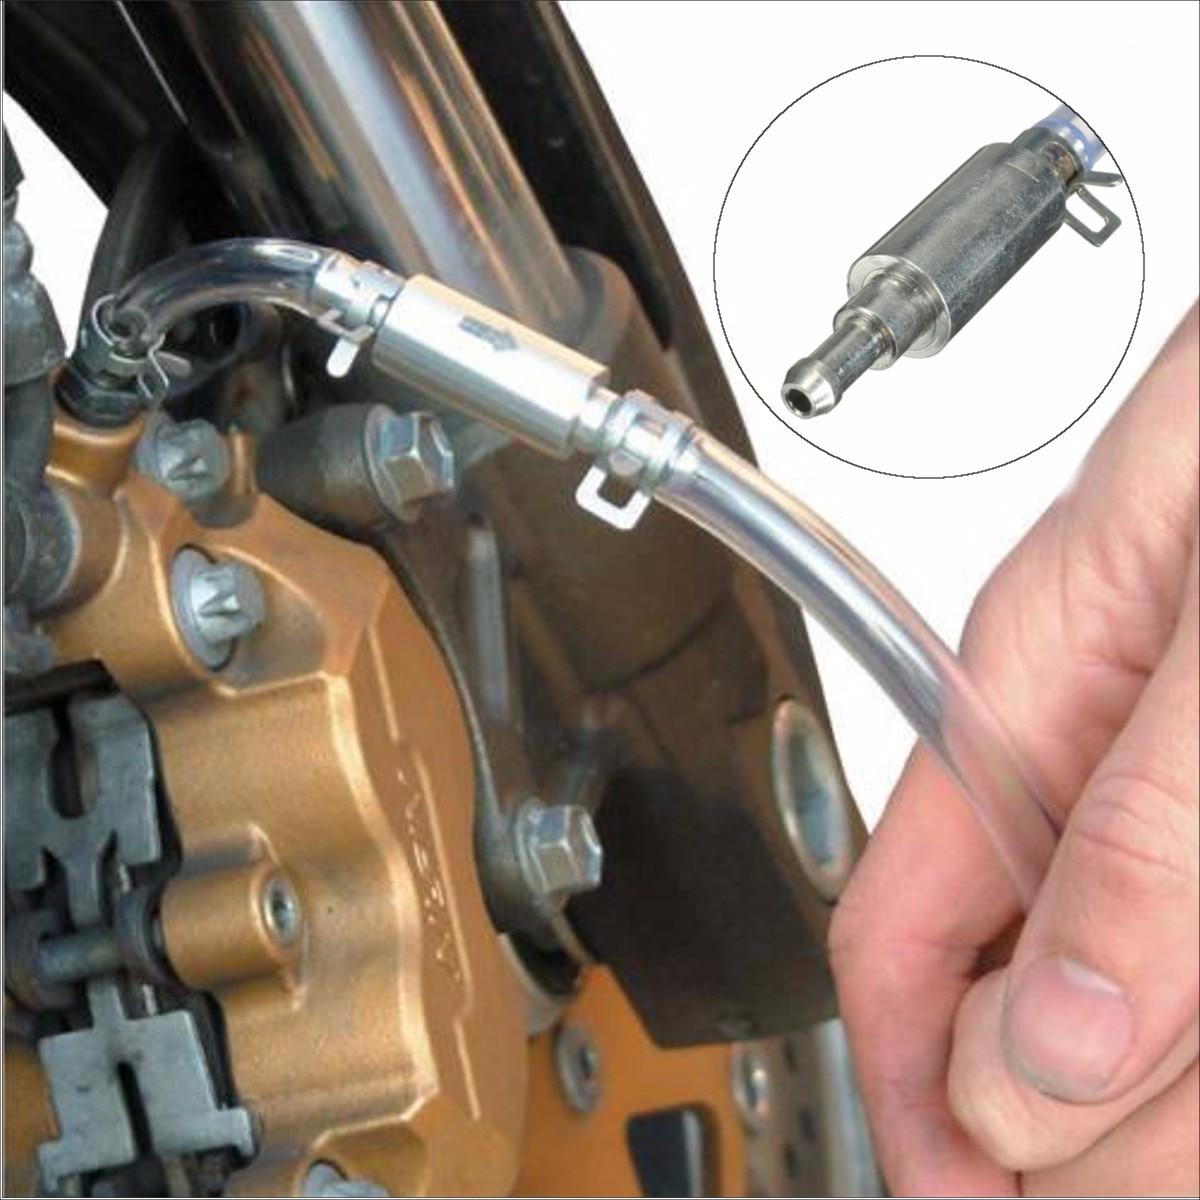 Car Hydraulic Brake Bleeder Clutch Tool Replacement Adapter Hose Kit Kit Auto Motorcycle Oil Pump Oil Bleeding